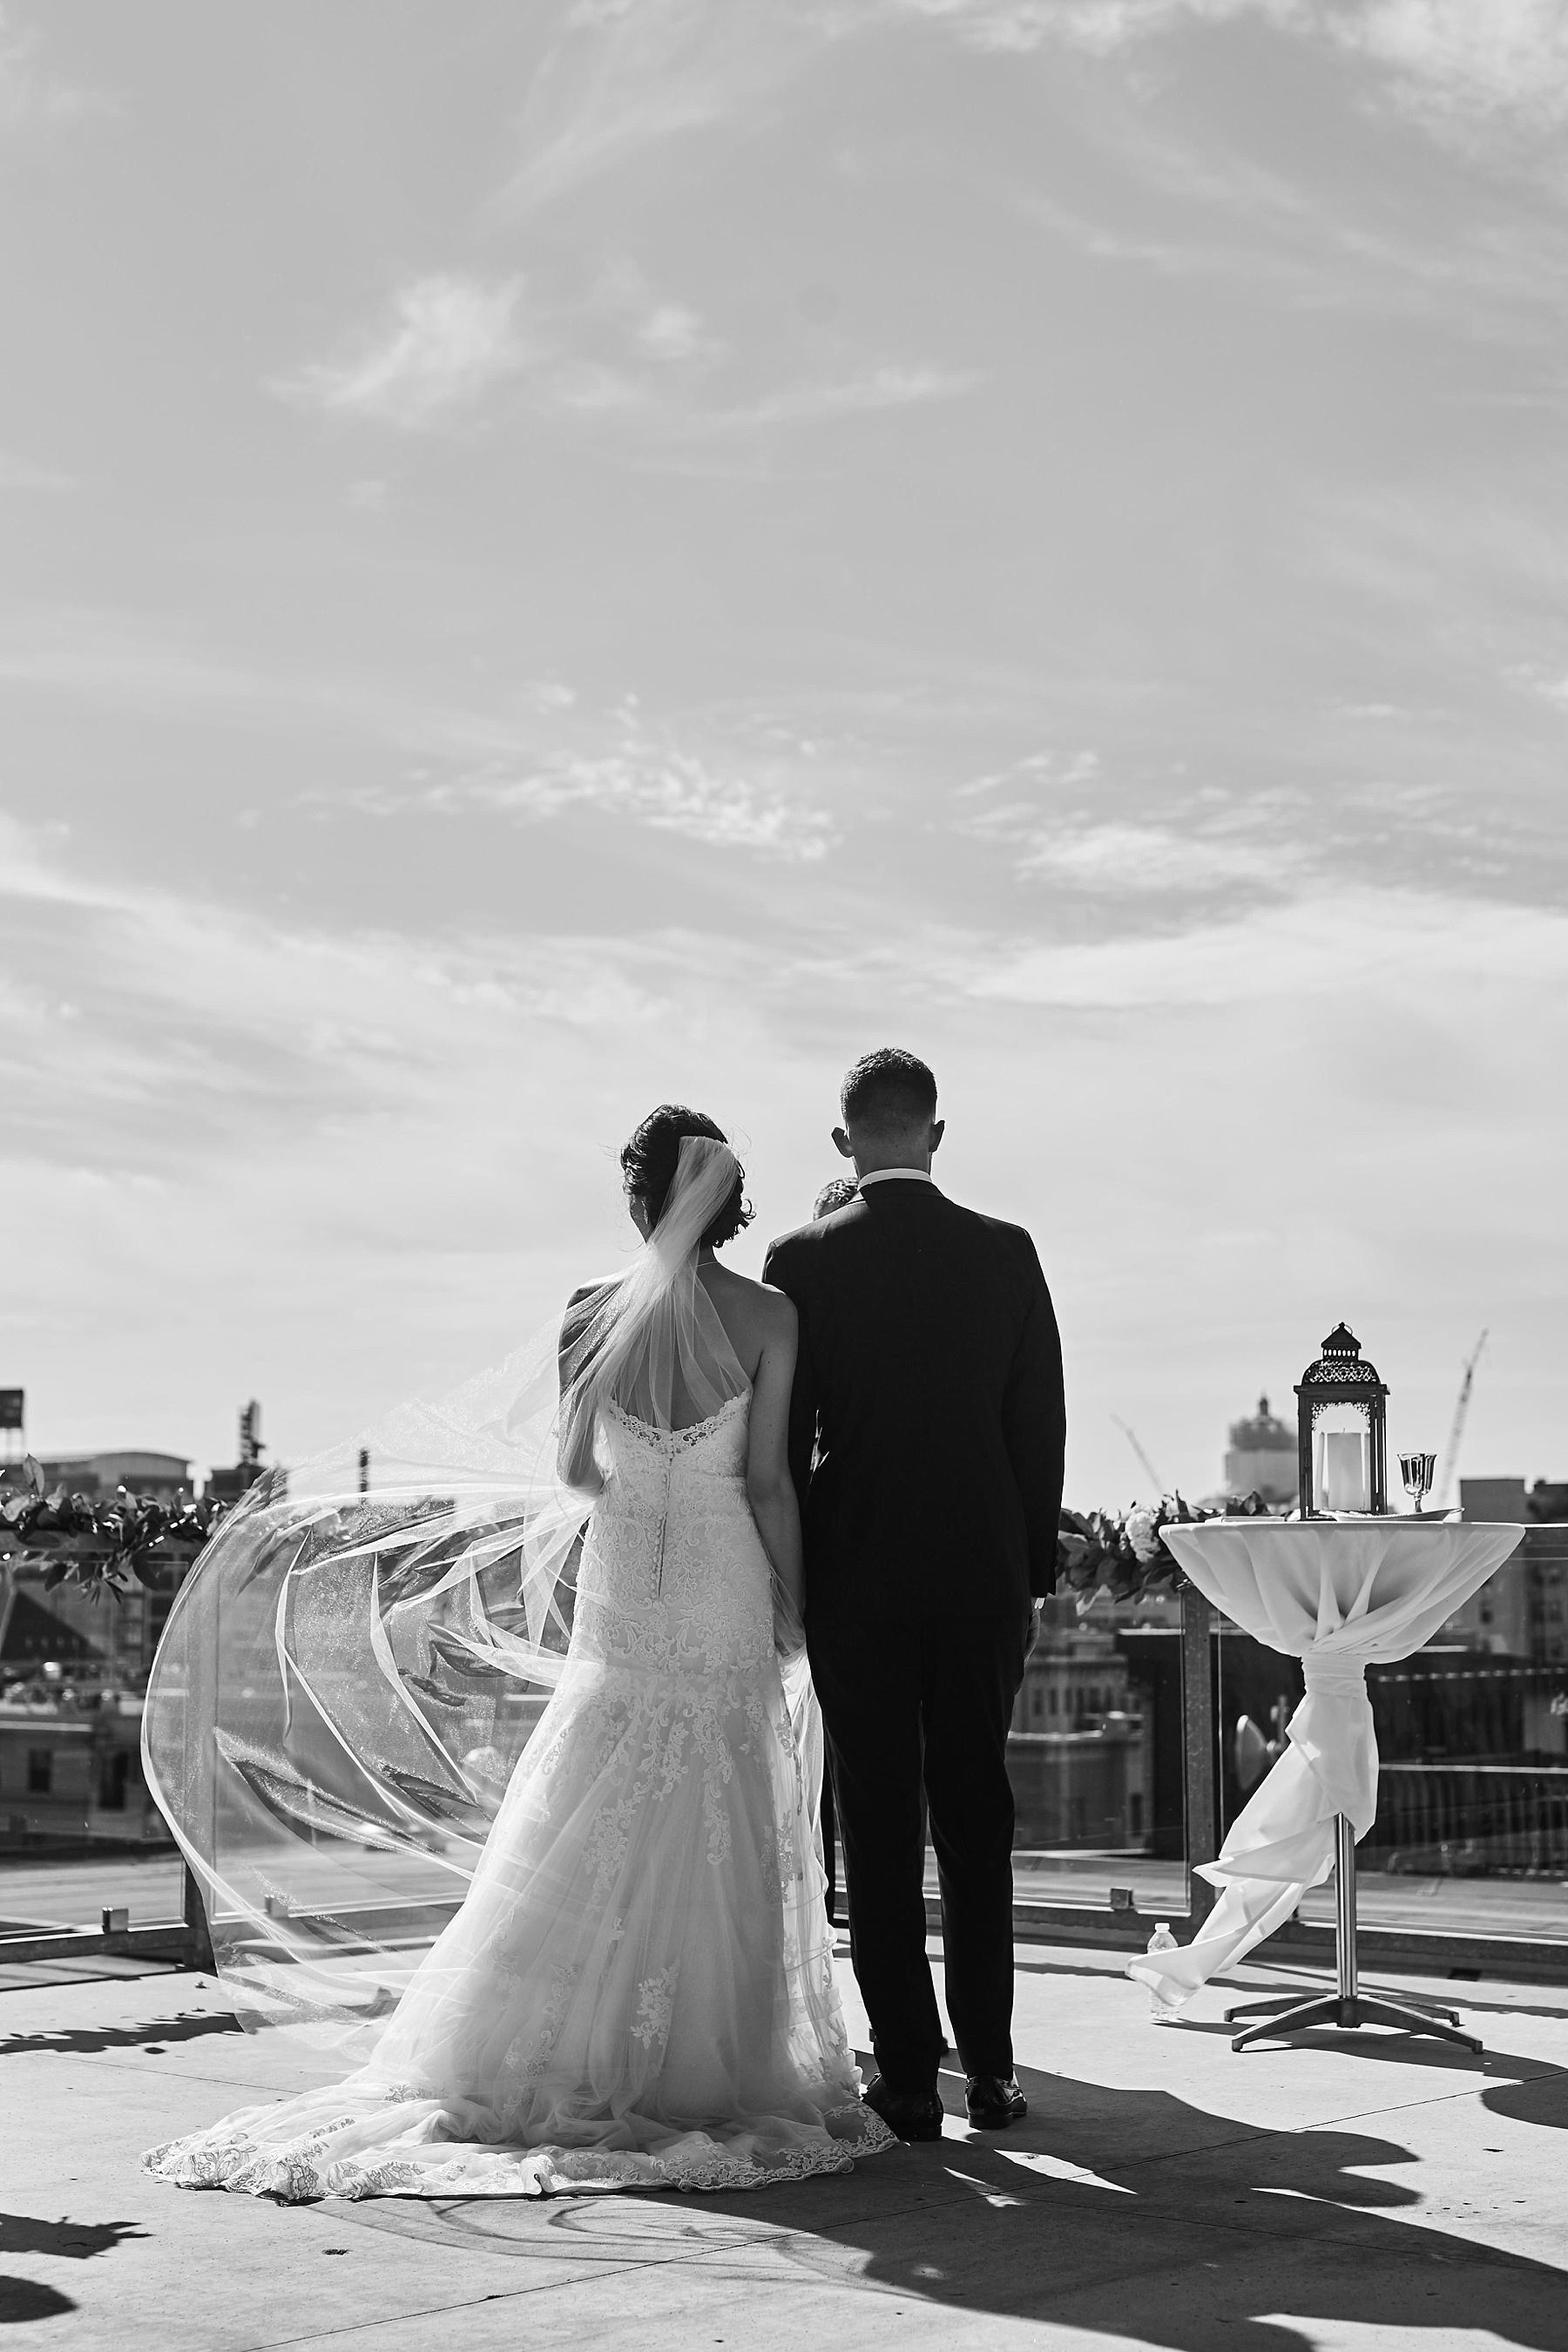 ABULAE-Wedding-Saint-paul-MN-Josh-Sofia-Wedding-Mears-Park_0764.jpg